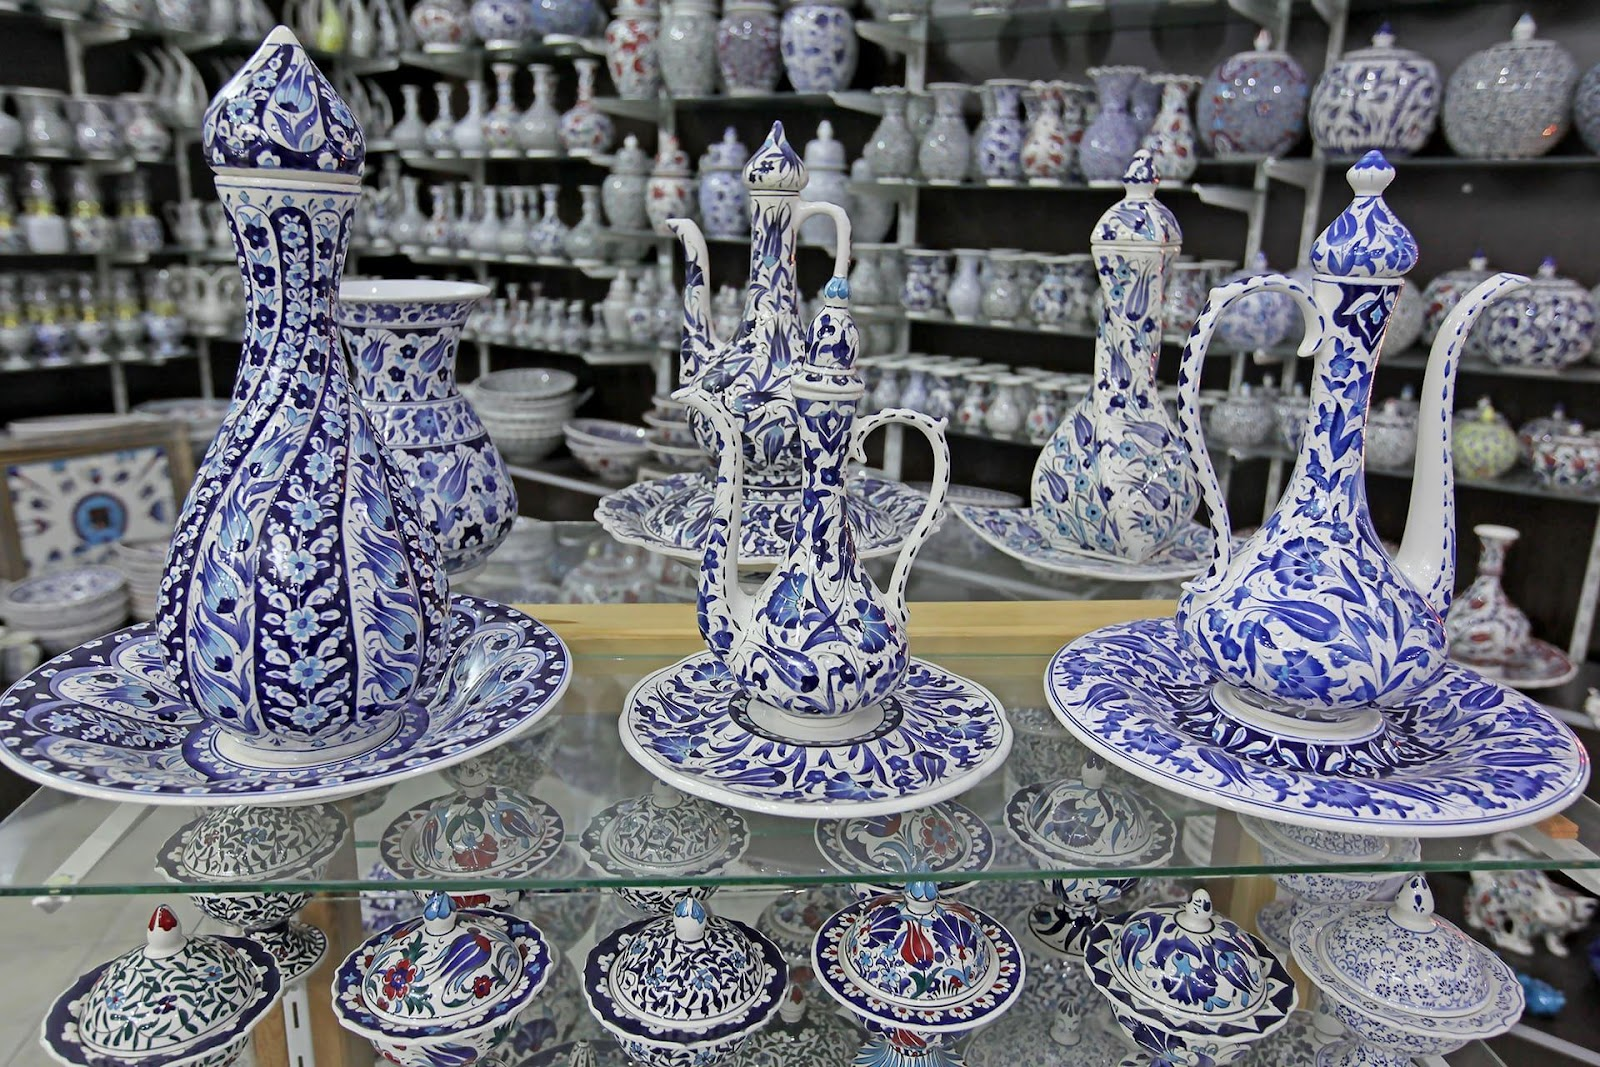 Bazar delle mattonelle di Kütahya